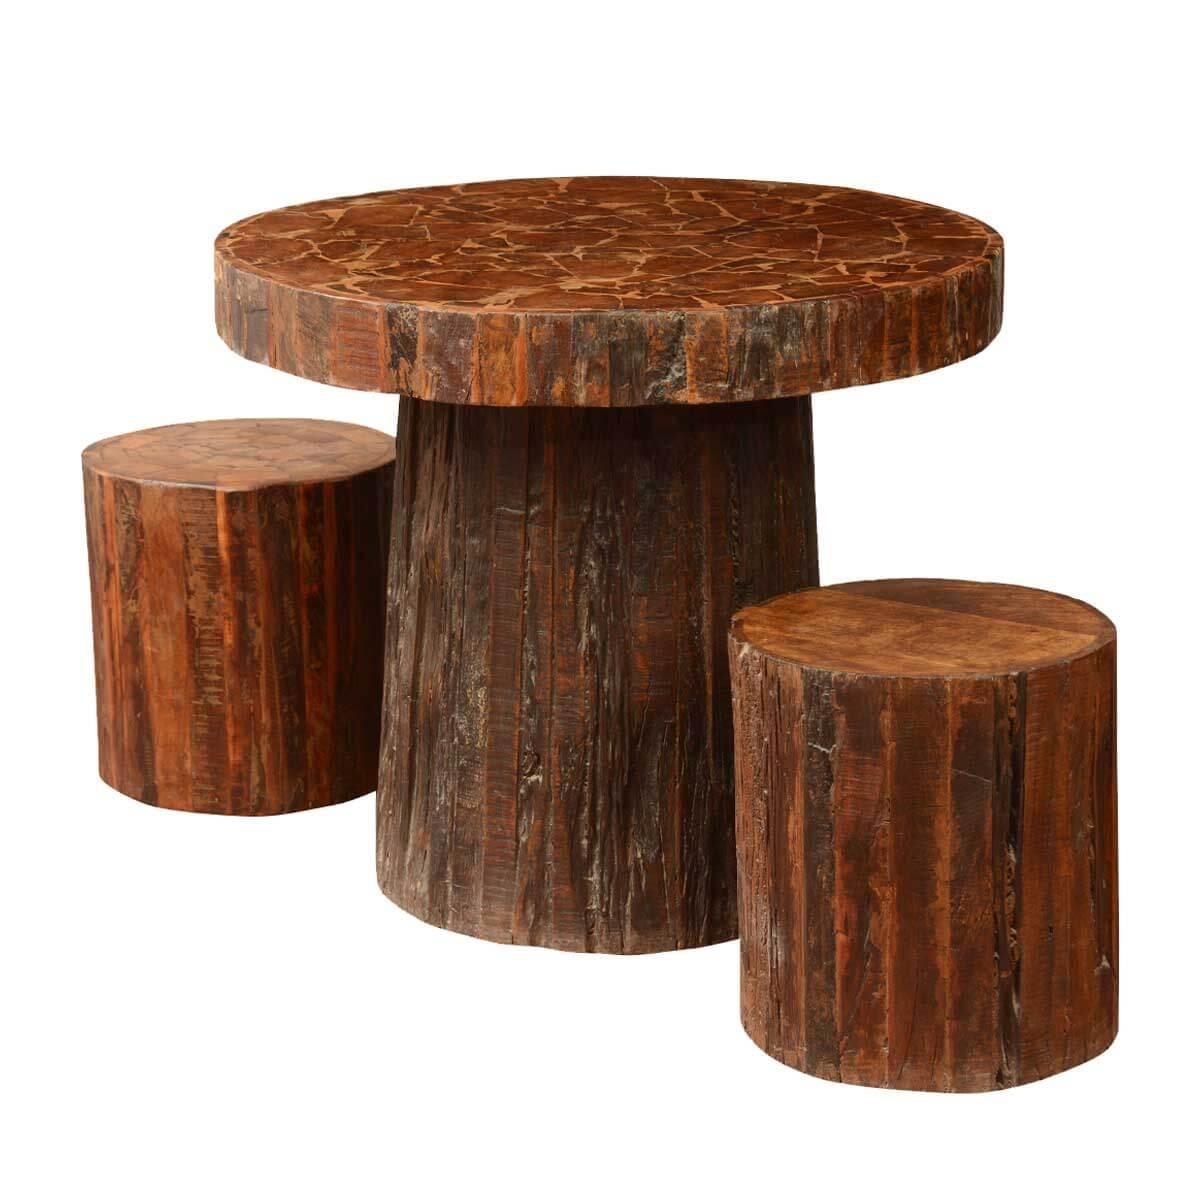 Miraculous Log Cabin Mushroom Railroad Ties Wood 3Pc Dining Table Stool Set Download Free Architecture Designs Crovemadebymaigaardcom